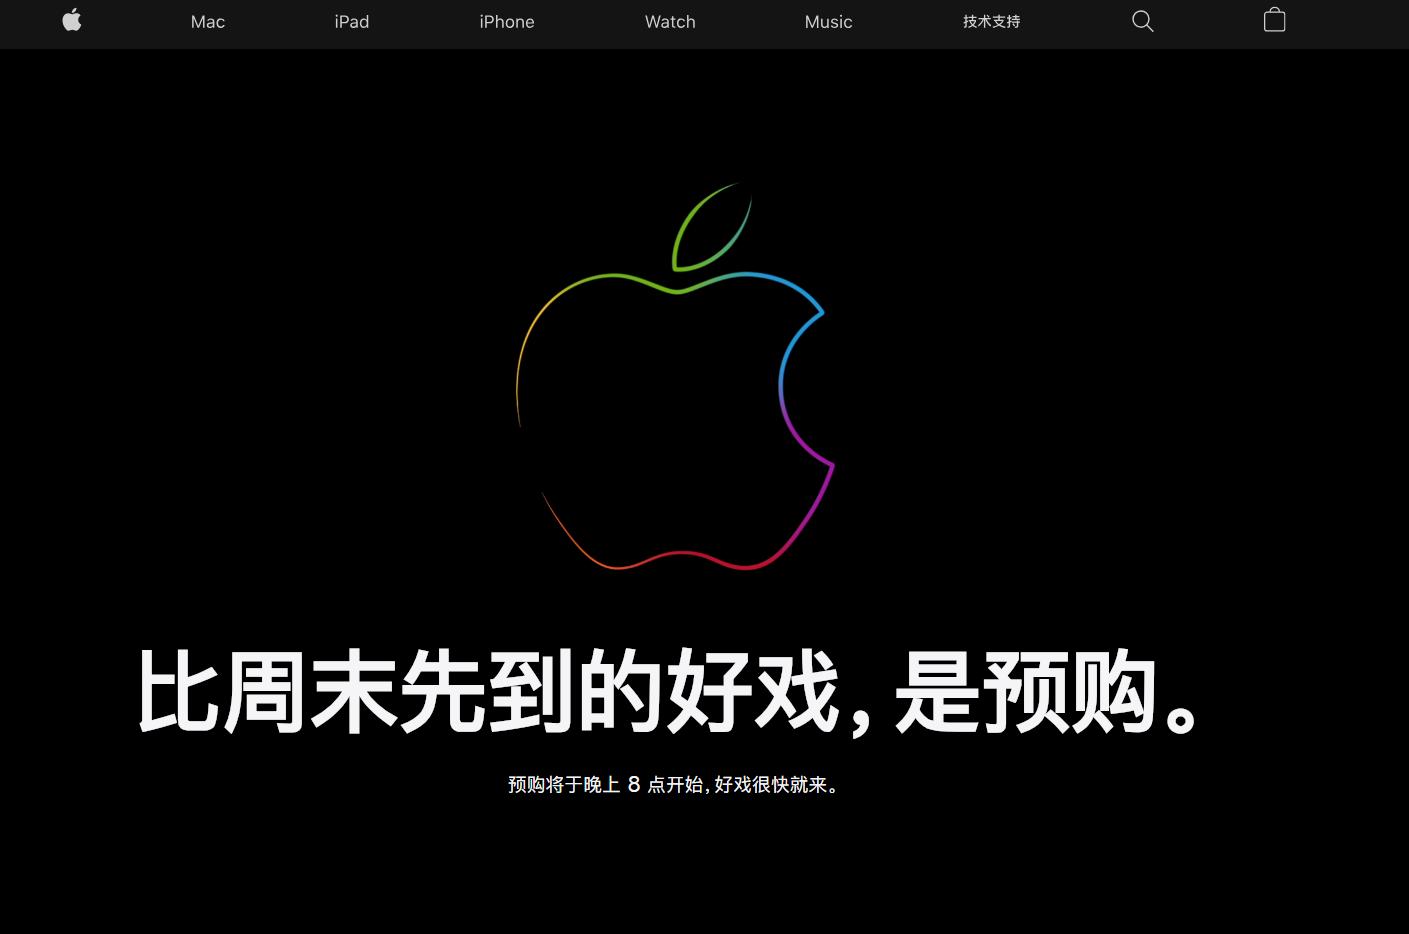 iPhone12 iPhone12Pro今晚开订 苹果中国官网开始维护